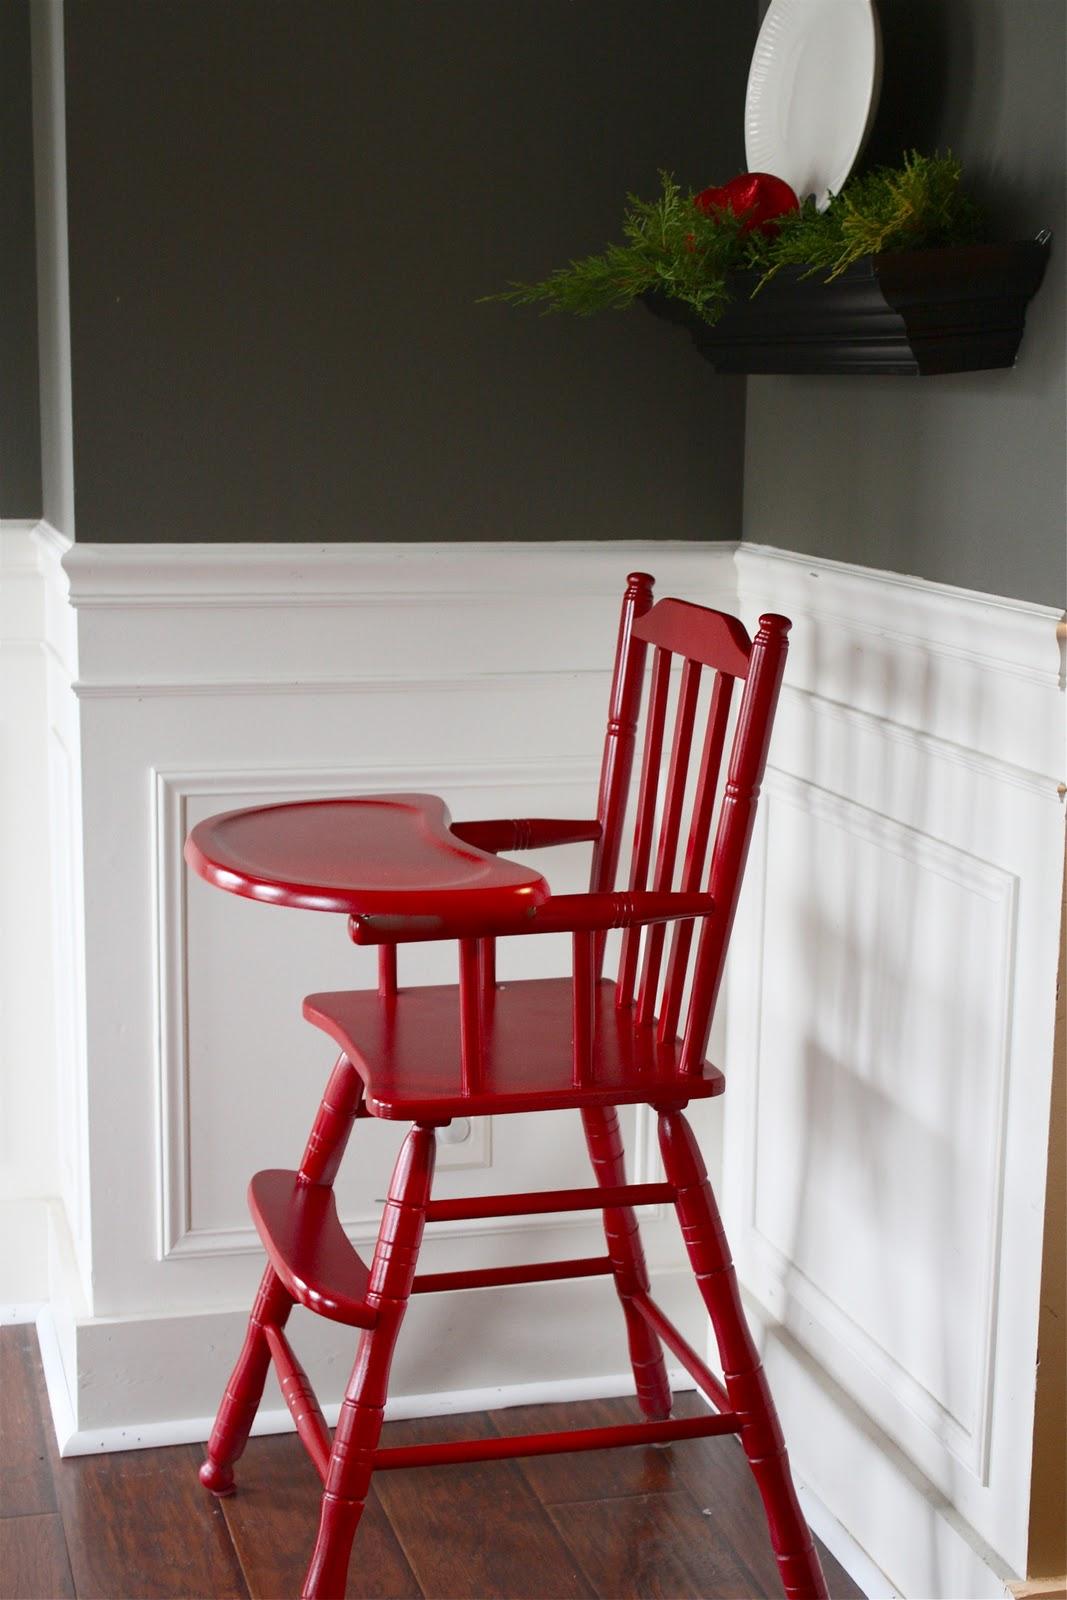 Painted wood high chair - Painted Wood High Chair 32